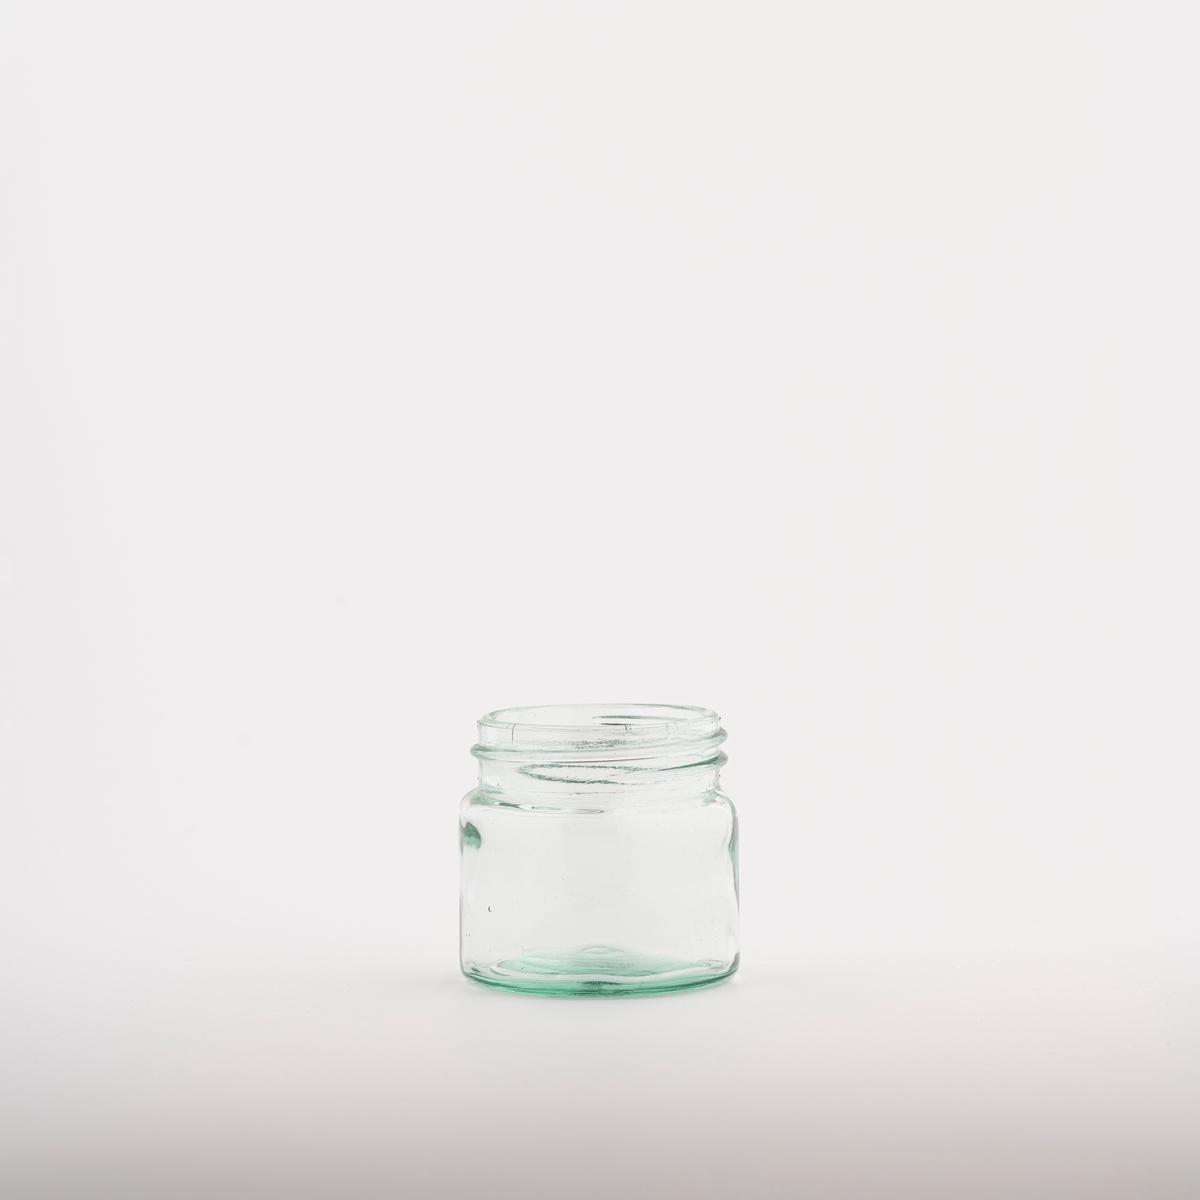 Lite glass med rund grunnflate.